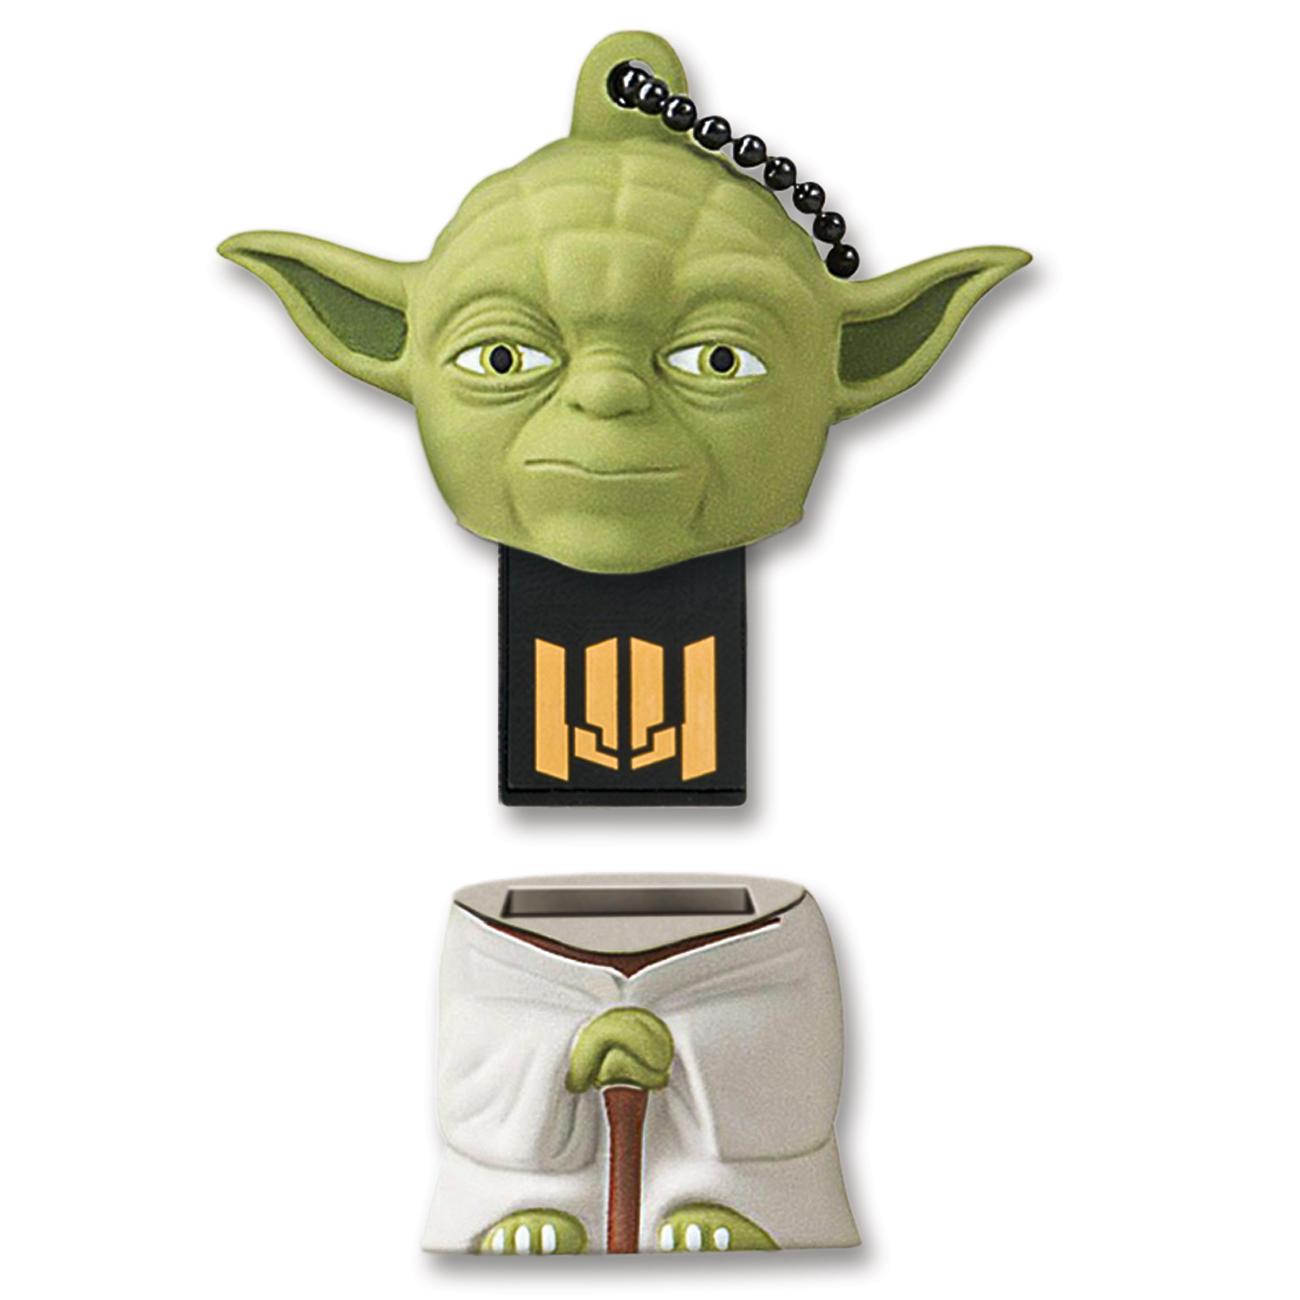 Star Wars USB-Stick, 8 GB, Yoda